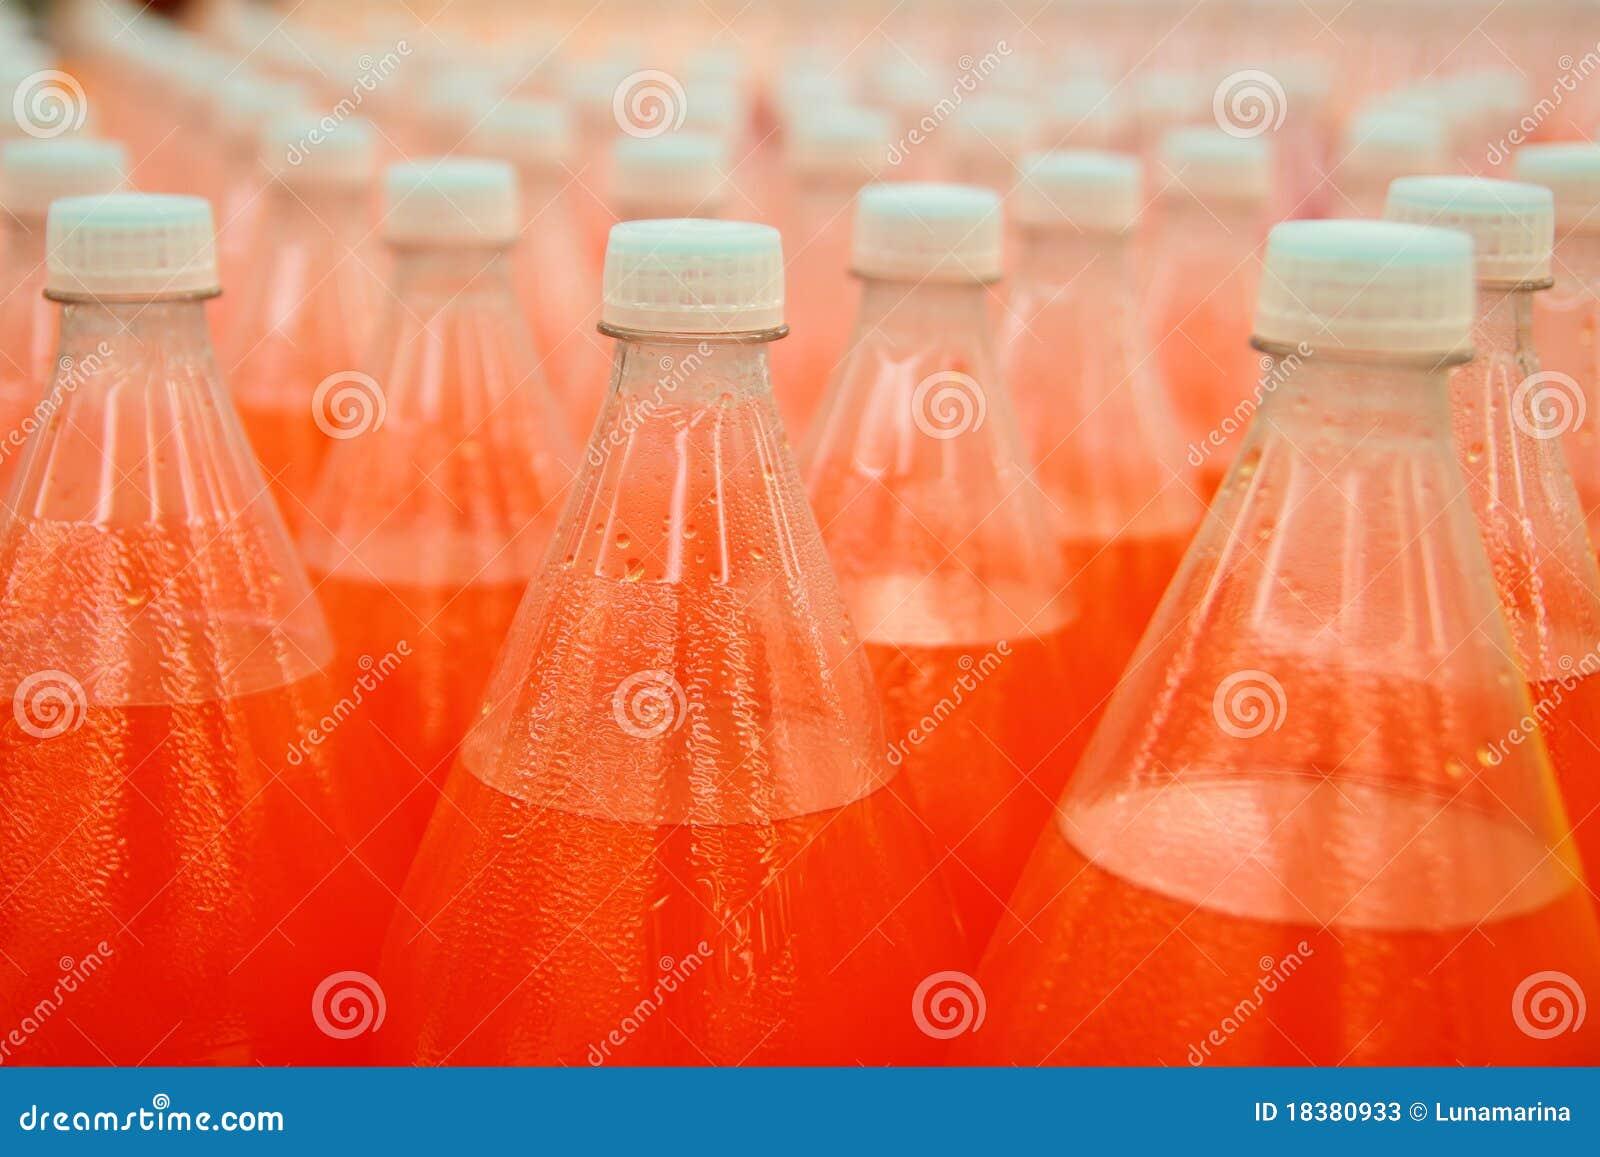 пластмасса померанца сока фабрики бутылки напитка